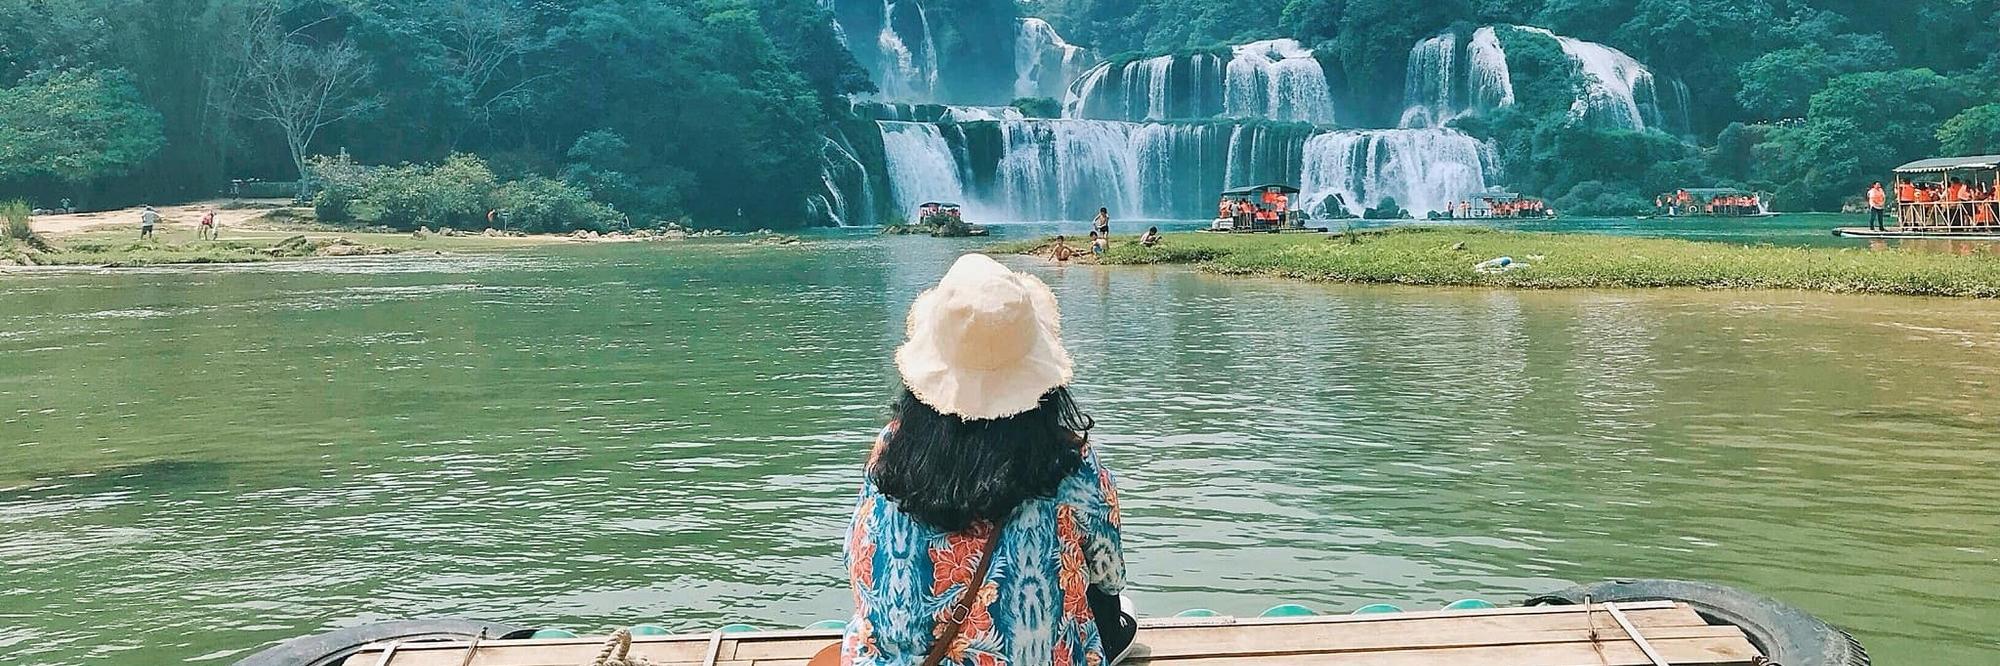 https://gody.vn/blog/myfoot5886/post/lich-trinh-2n1d-trai-nghiem-cao-bang-vien-ngoc-xanh-cua-mien-dong-bac-4201